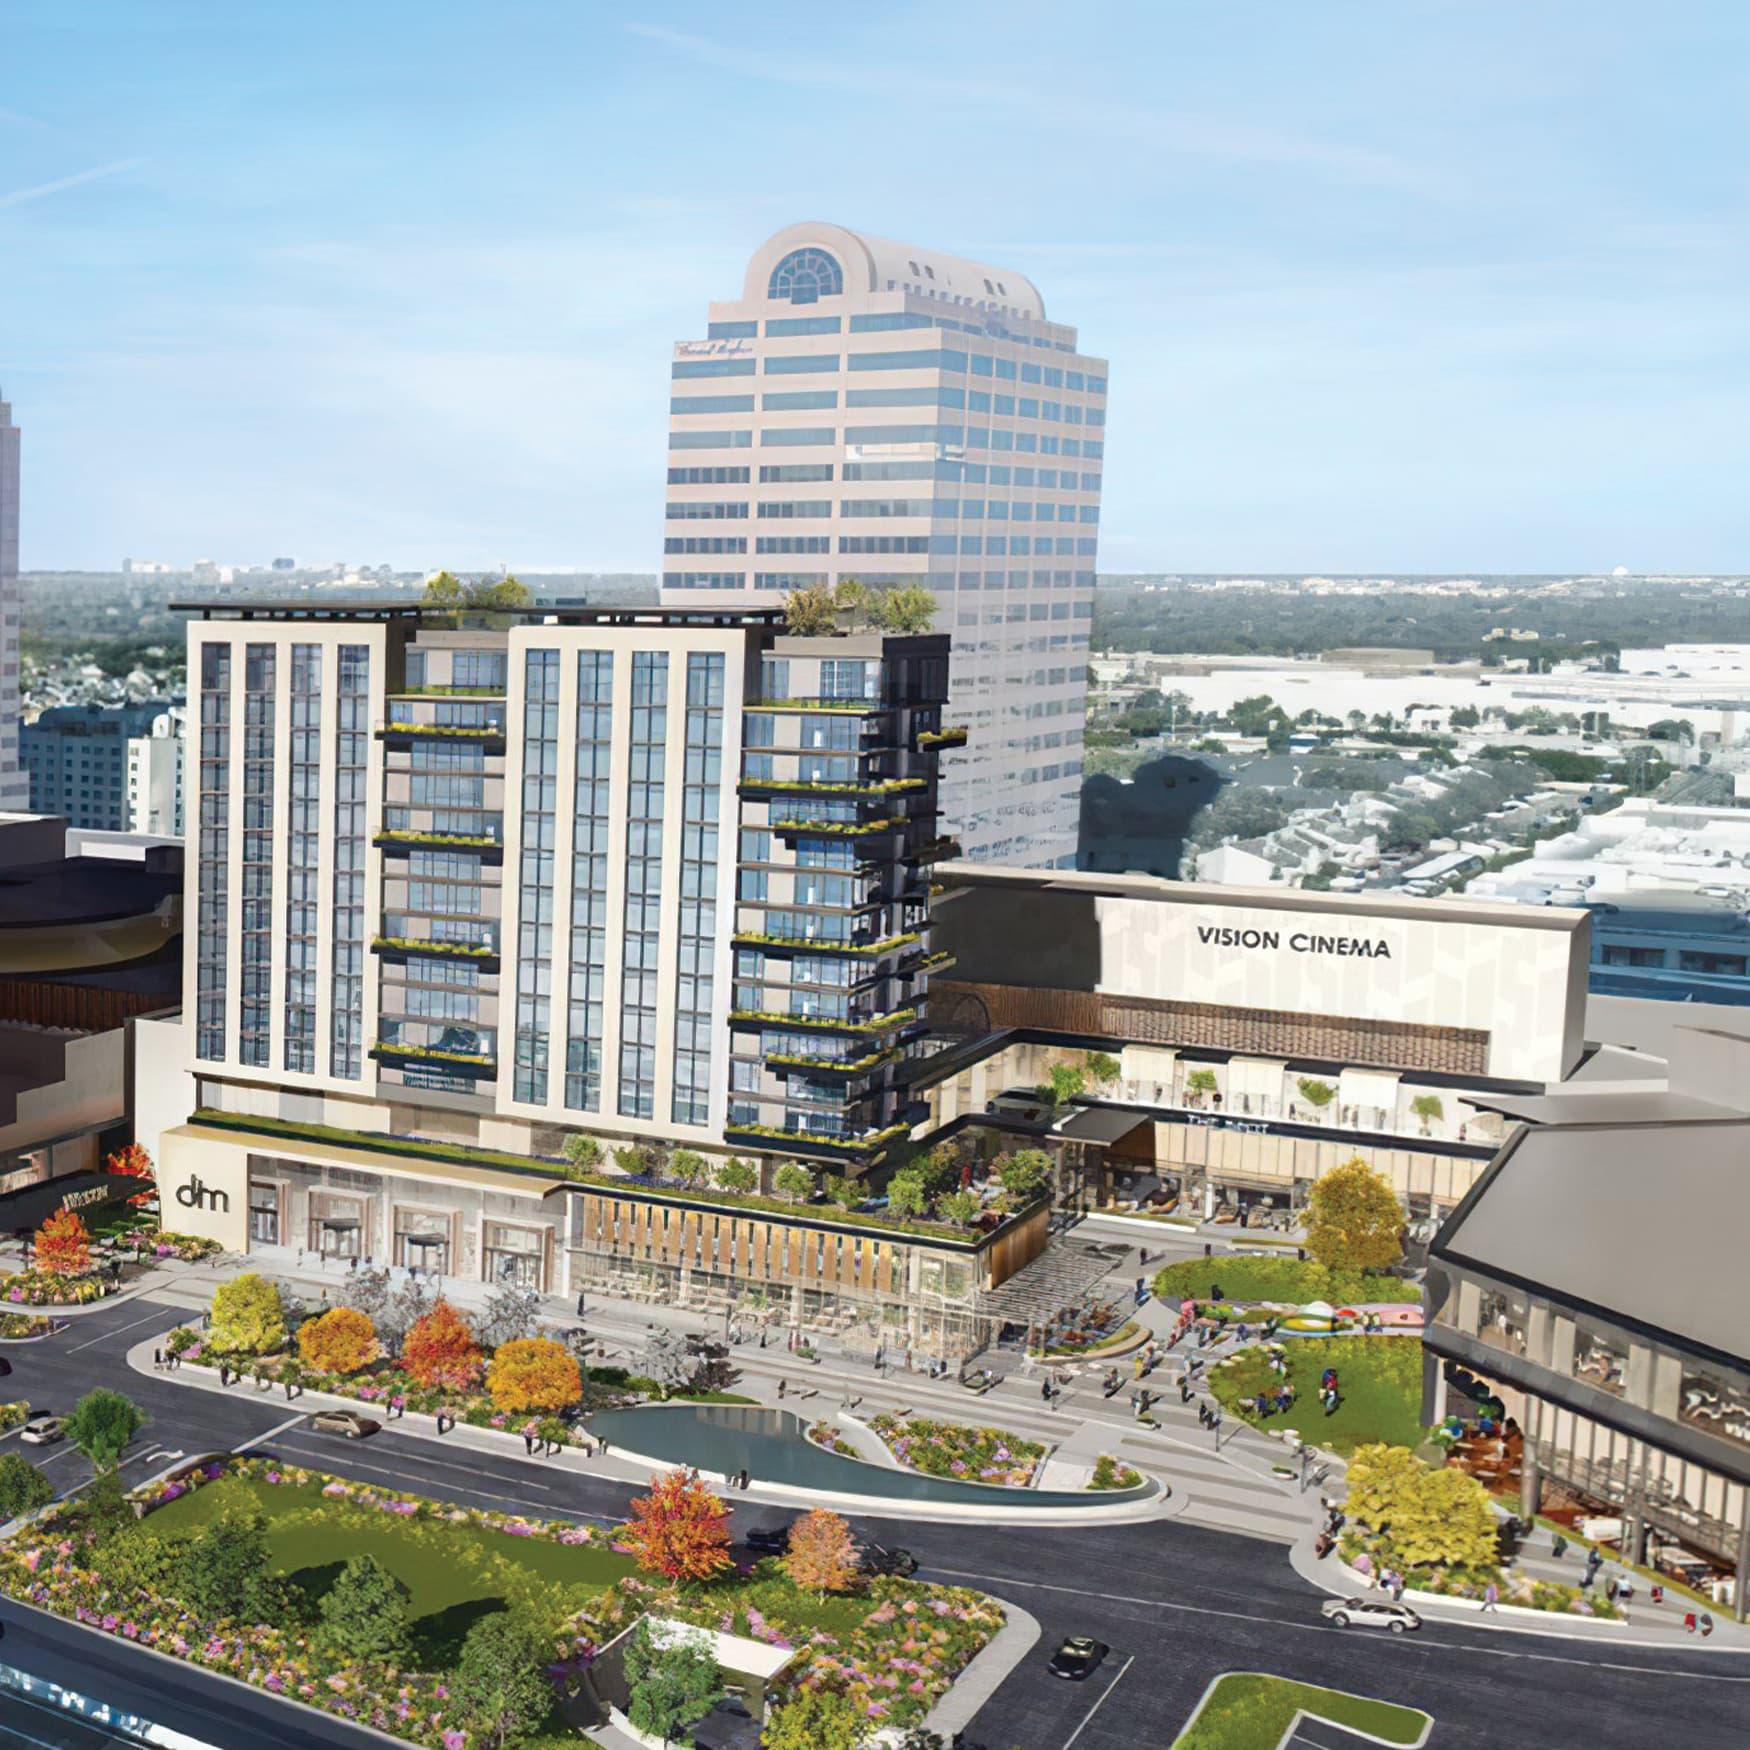 Architectural Rendering of Galleria located in Dallas, Texas